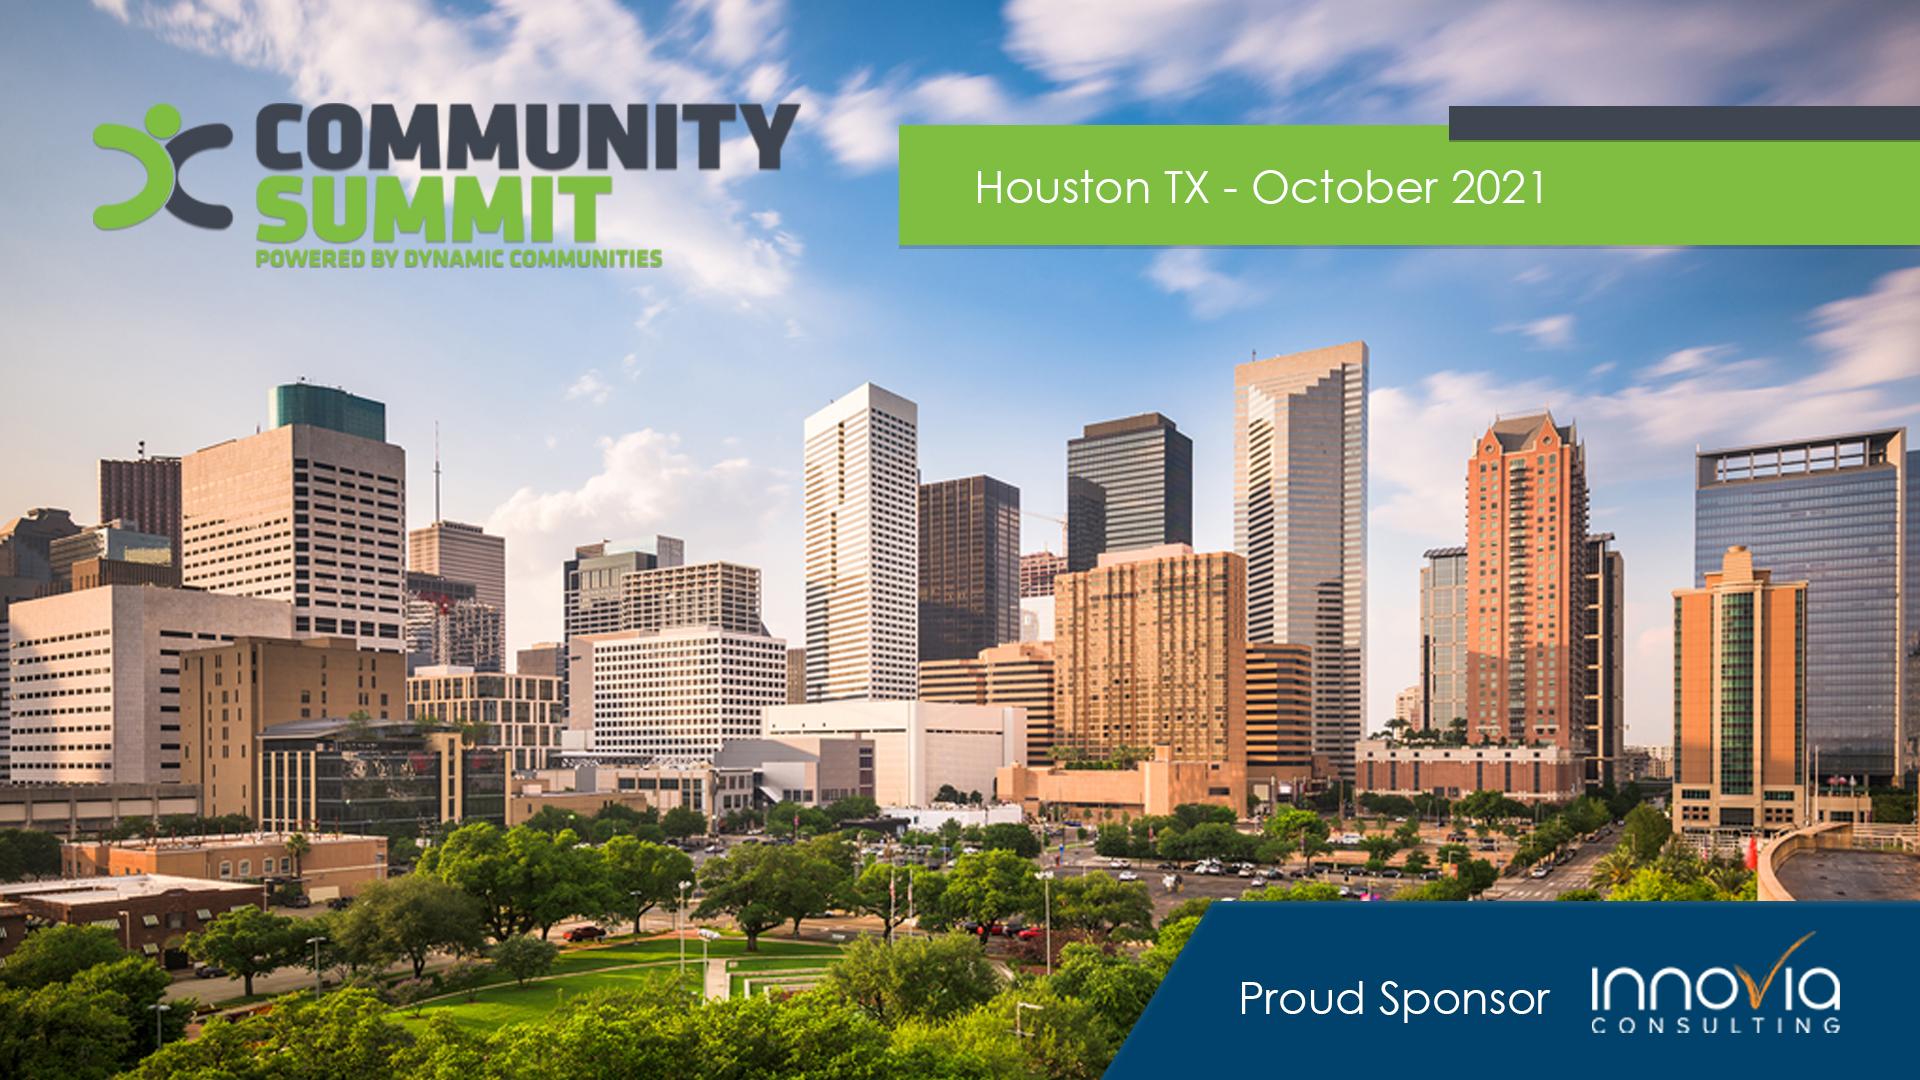 Innovia Presents at Community Summit 2021